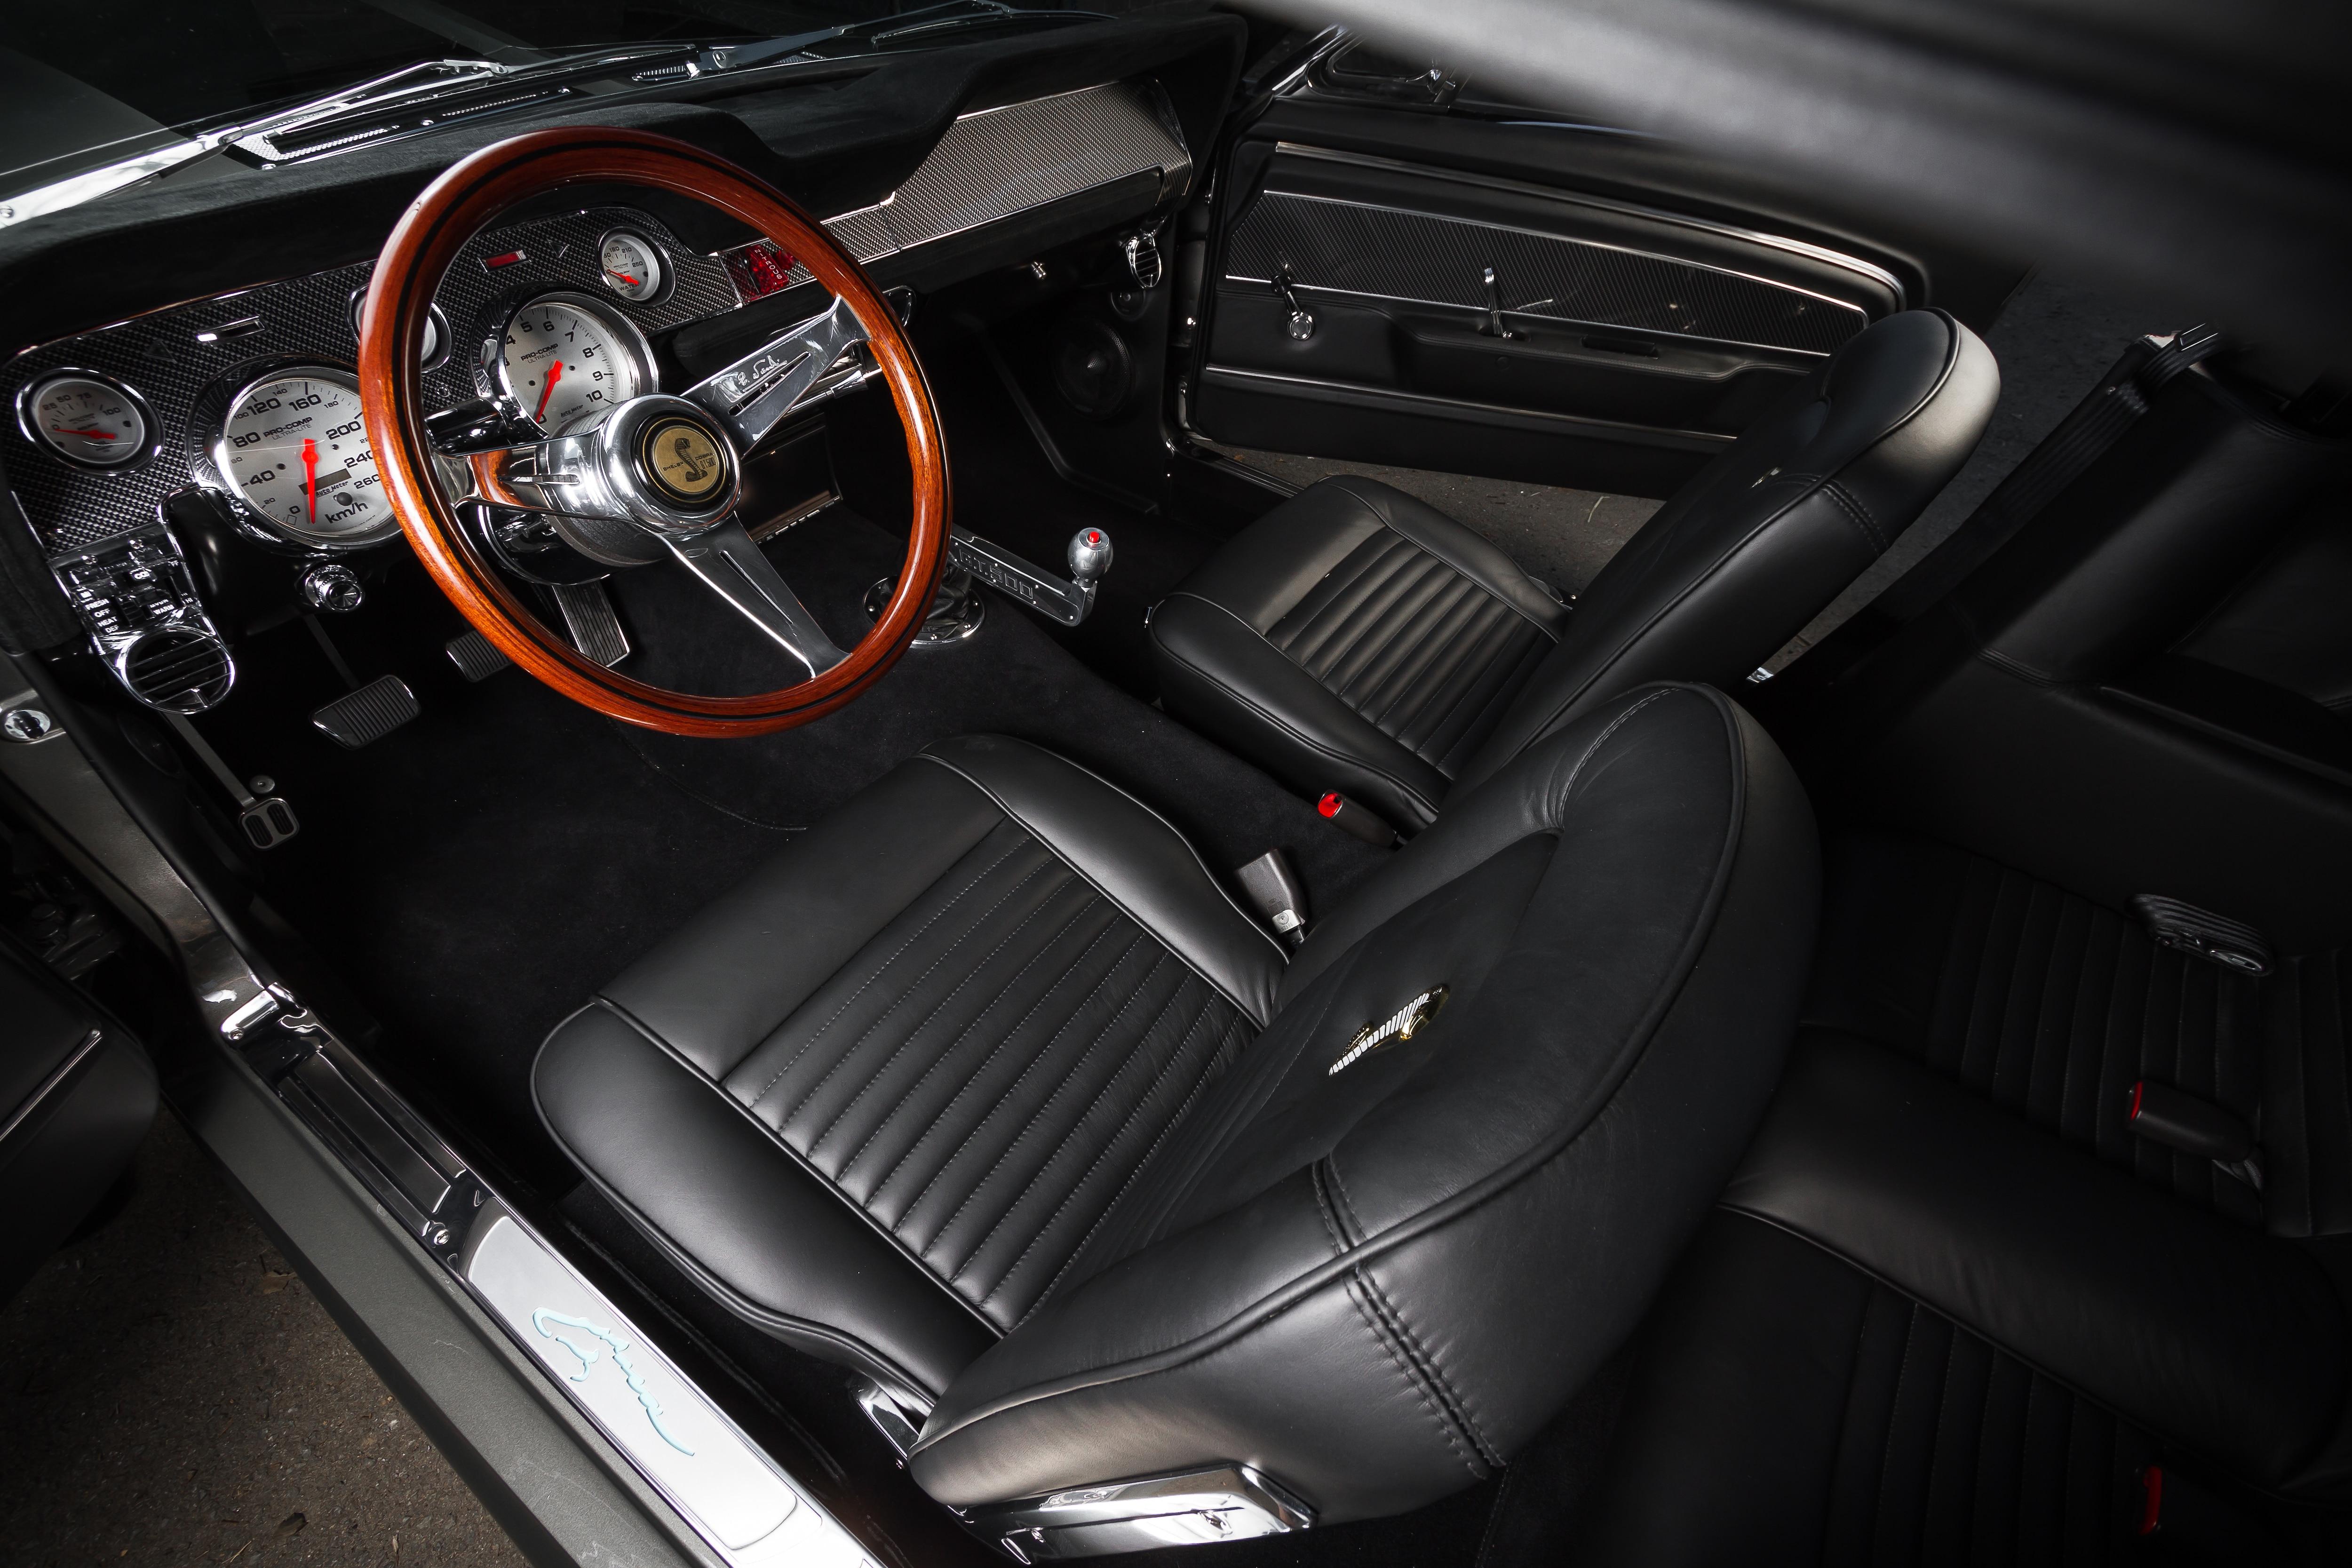 14 1967 Ford Mustang Interior